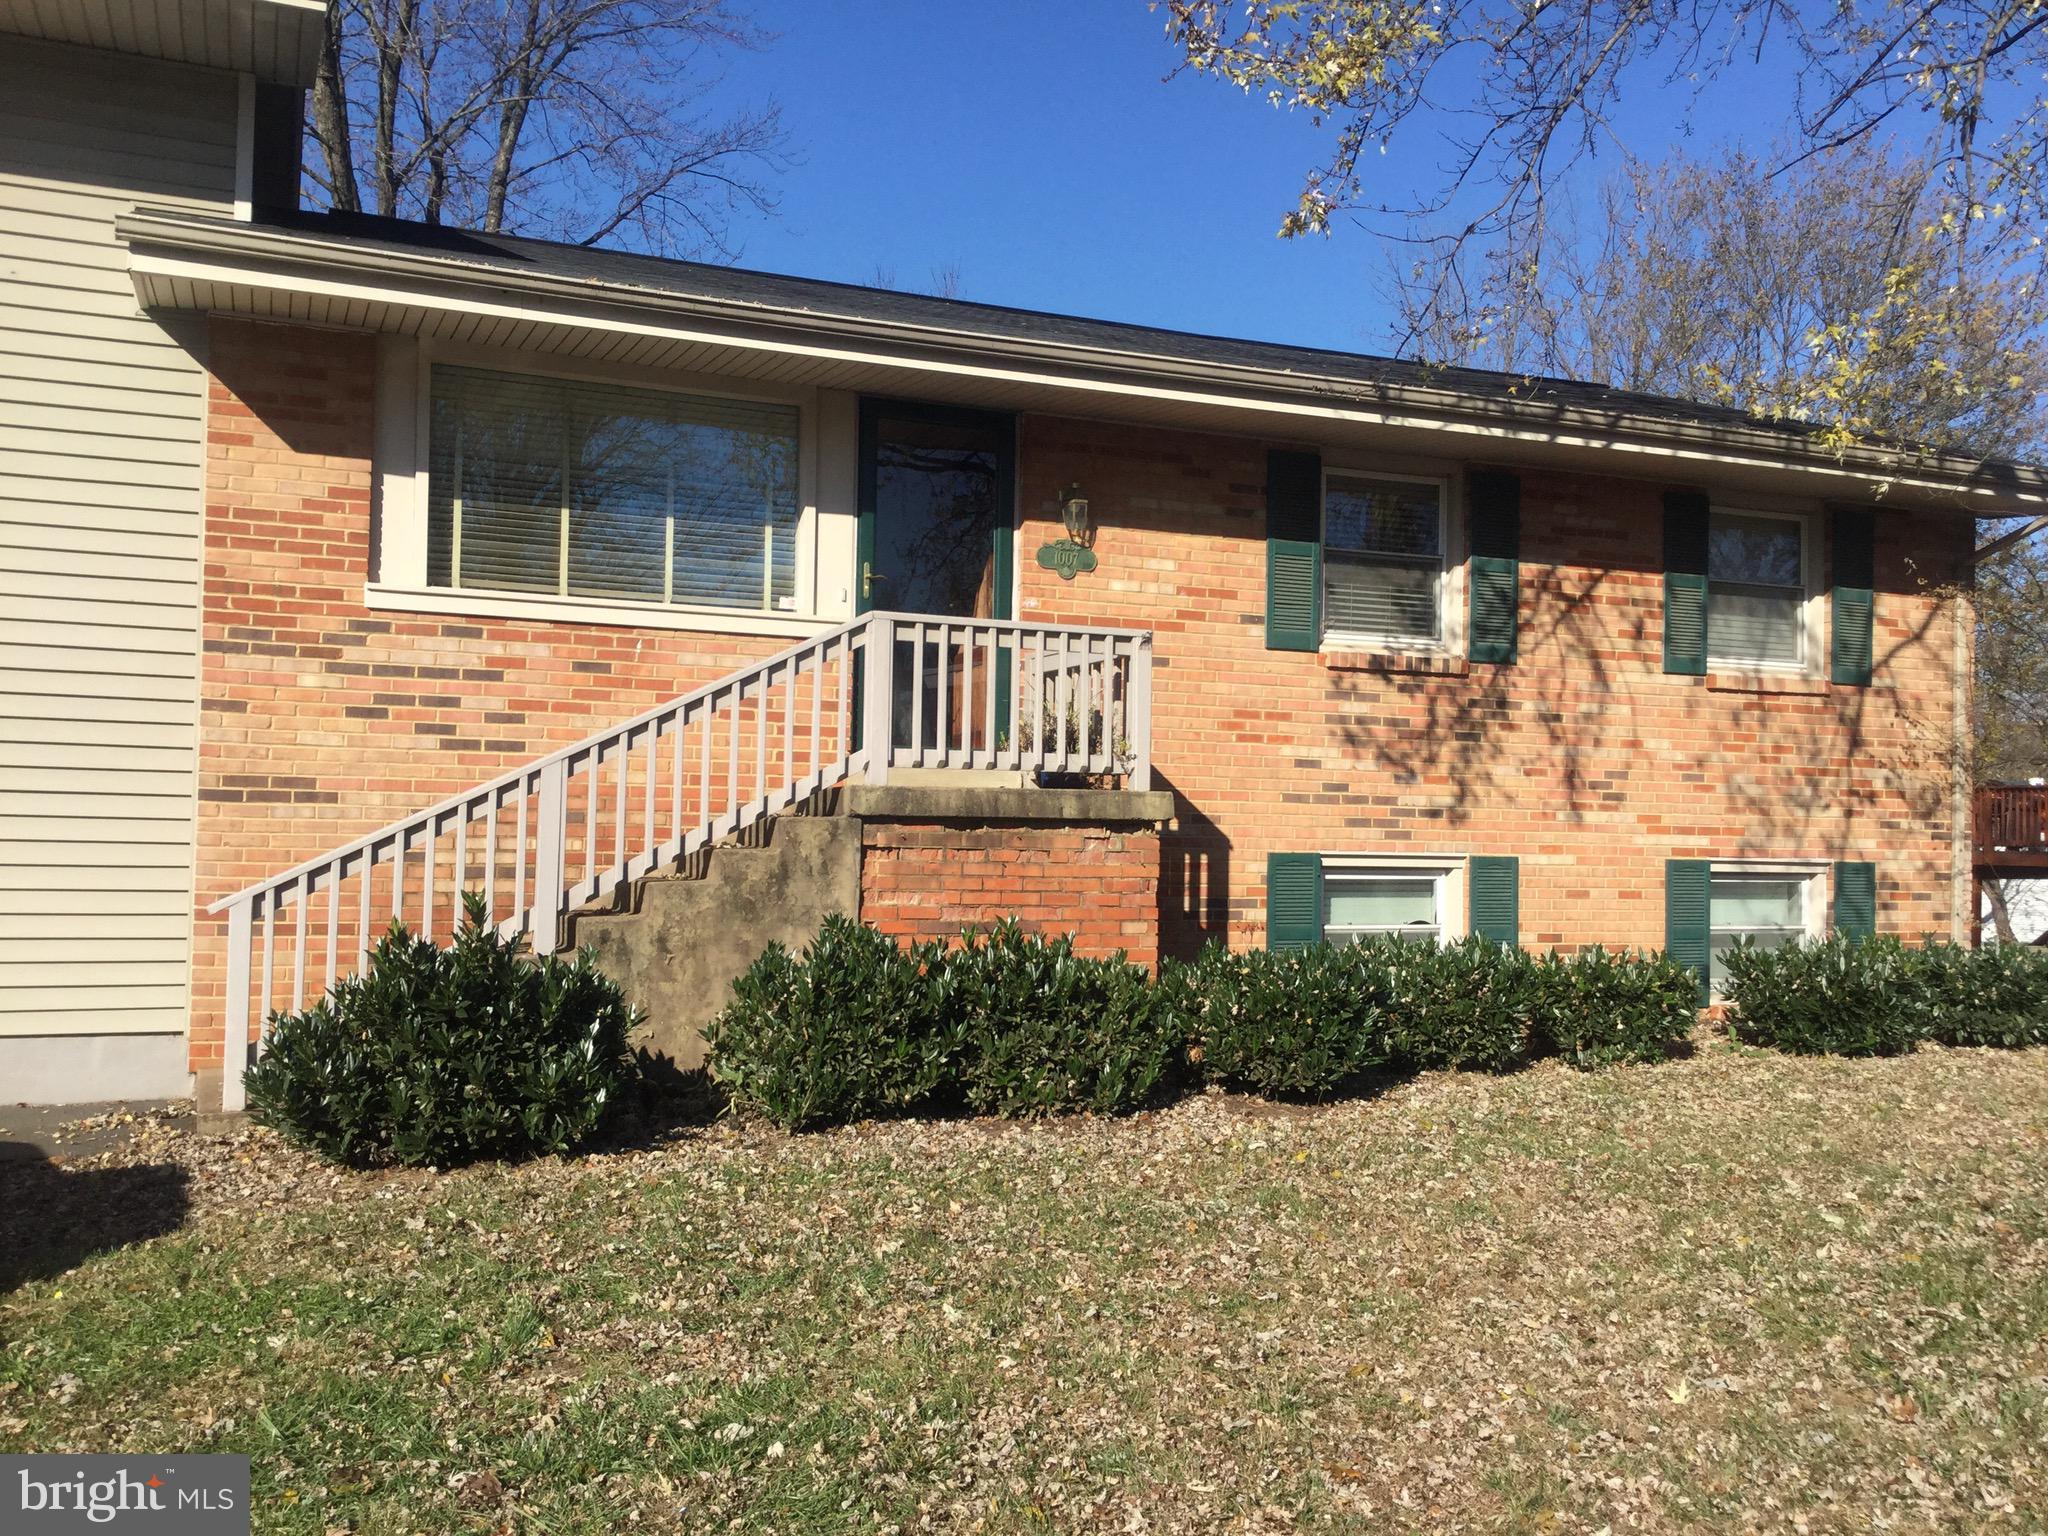 1007 S Buckingham Road, Sterling, VA 20164 | Heather Gosman, licensed  Virginia Real Estate Agent - RE/MAX Gateway Ashburn